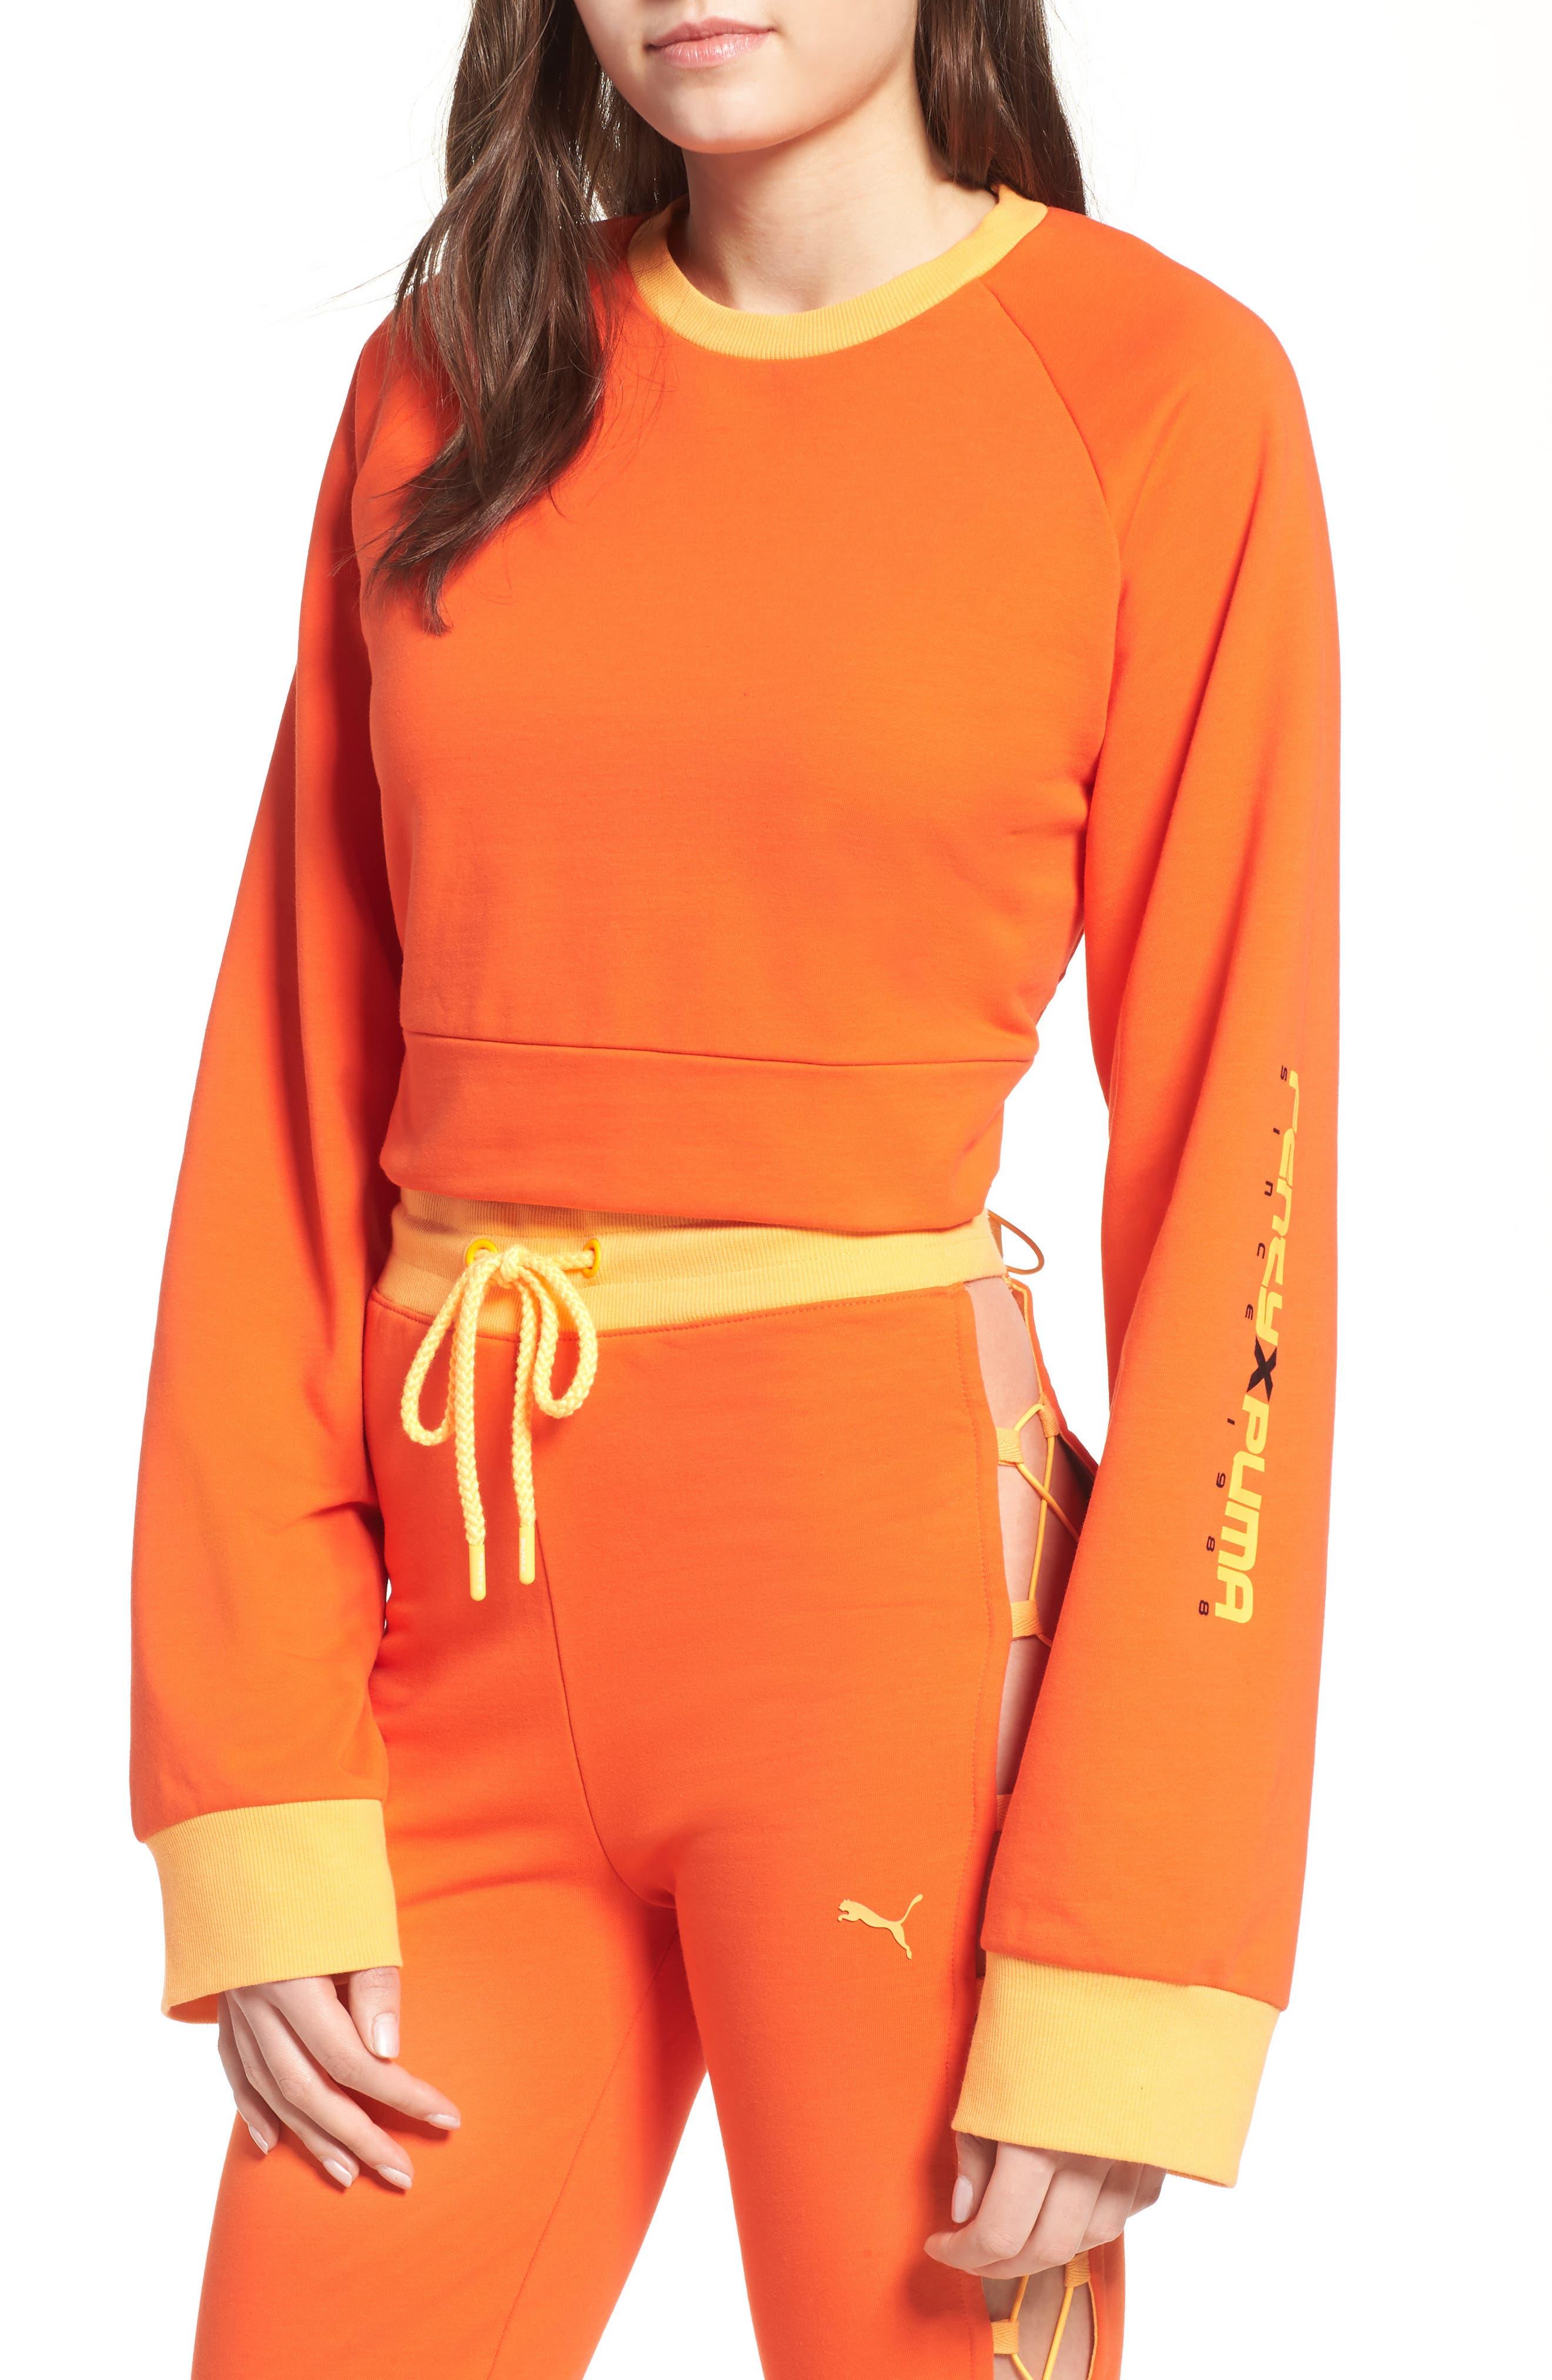 FENTY PUMA by Rihanna Lace-Up Back Sweatshirt